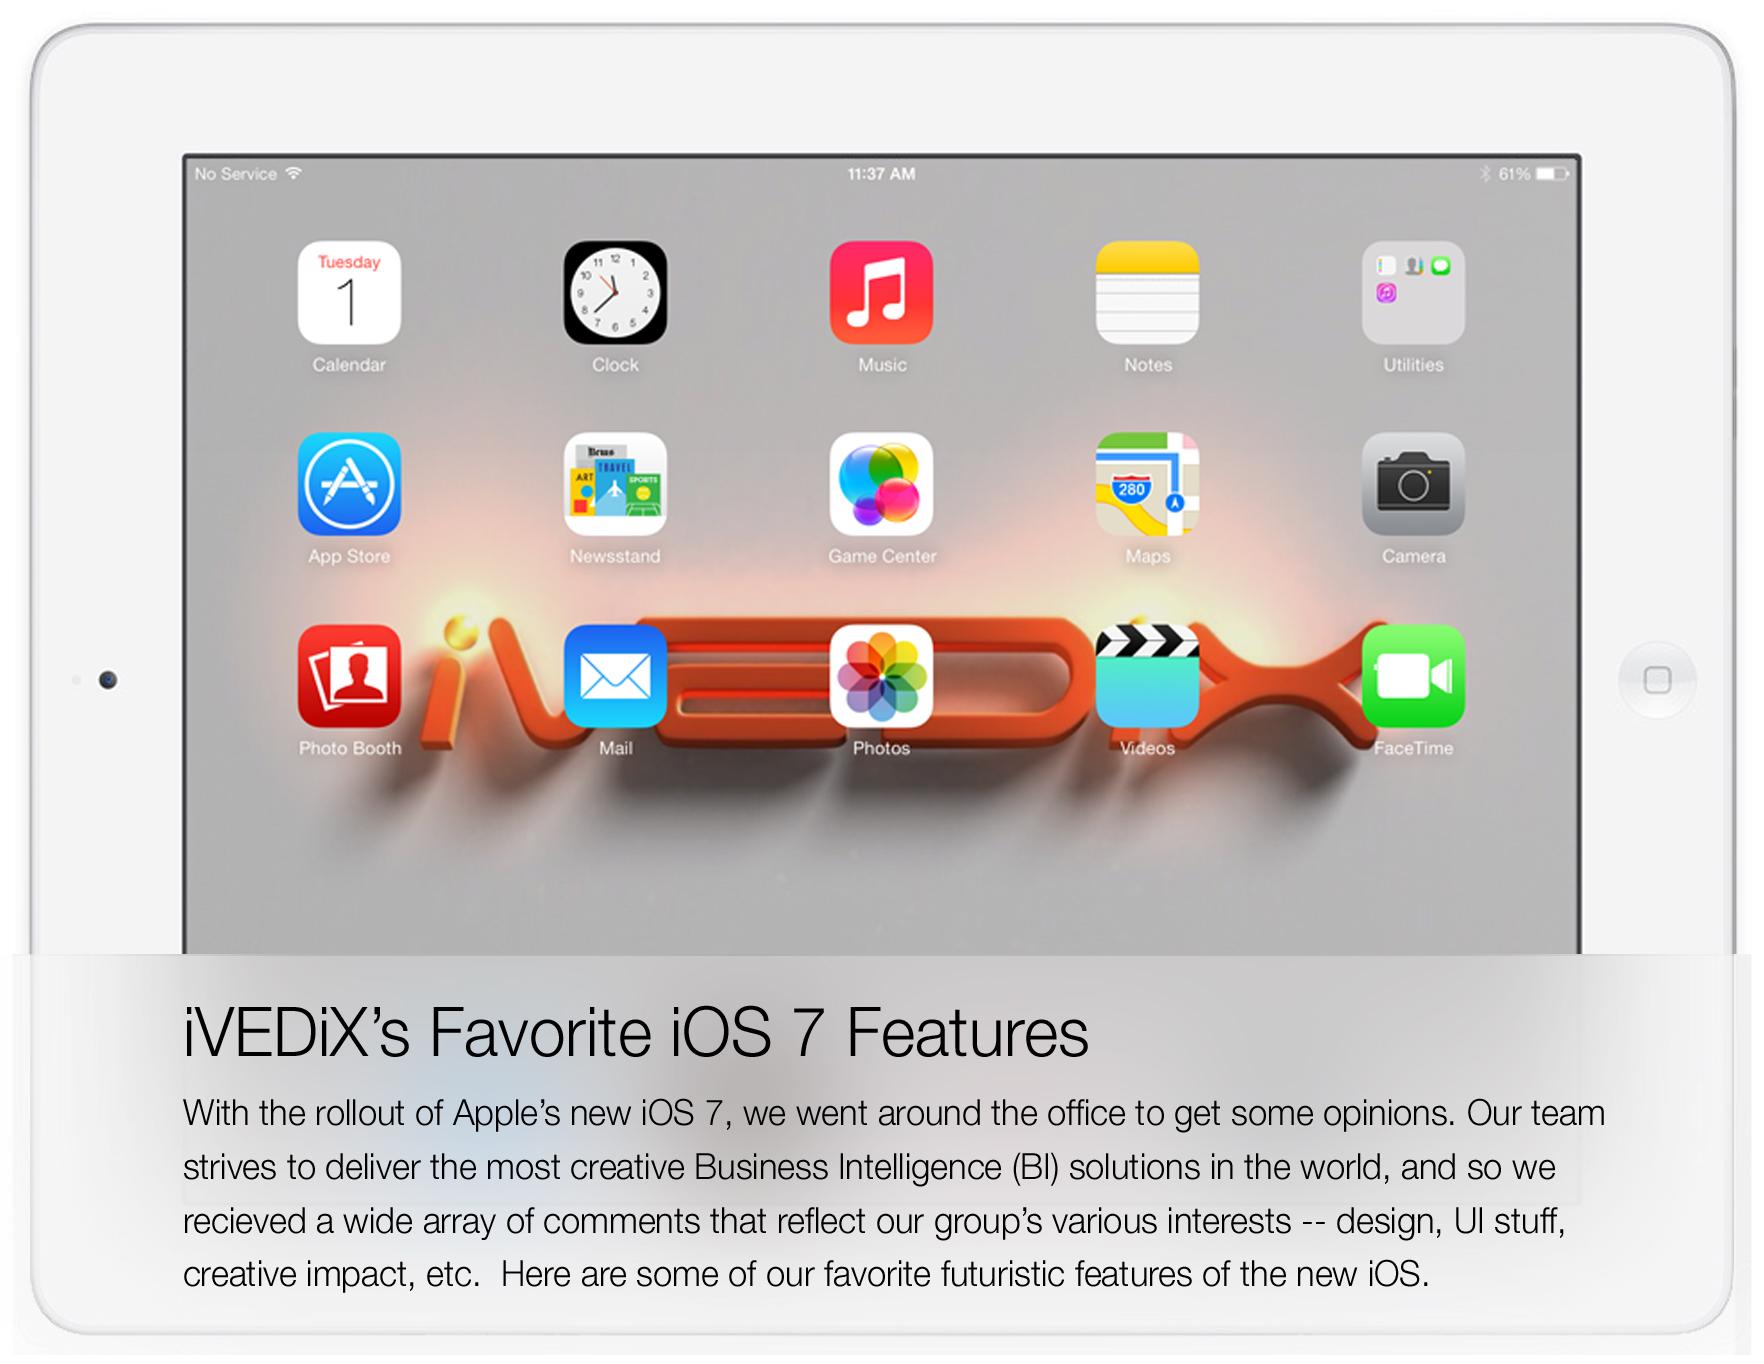 iVEDiX's Favorite iOS 7 Features